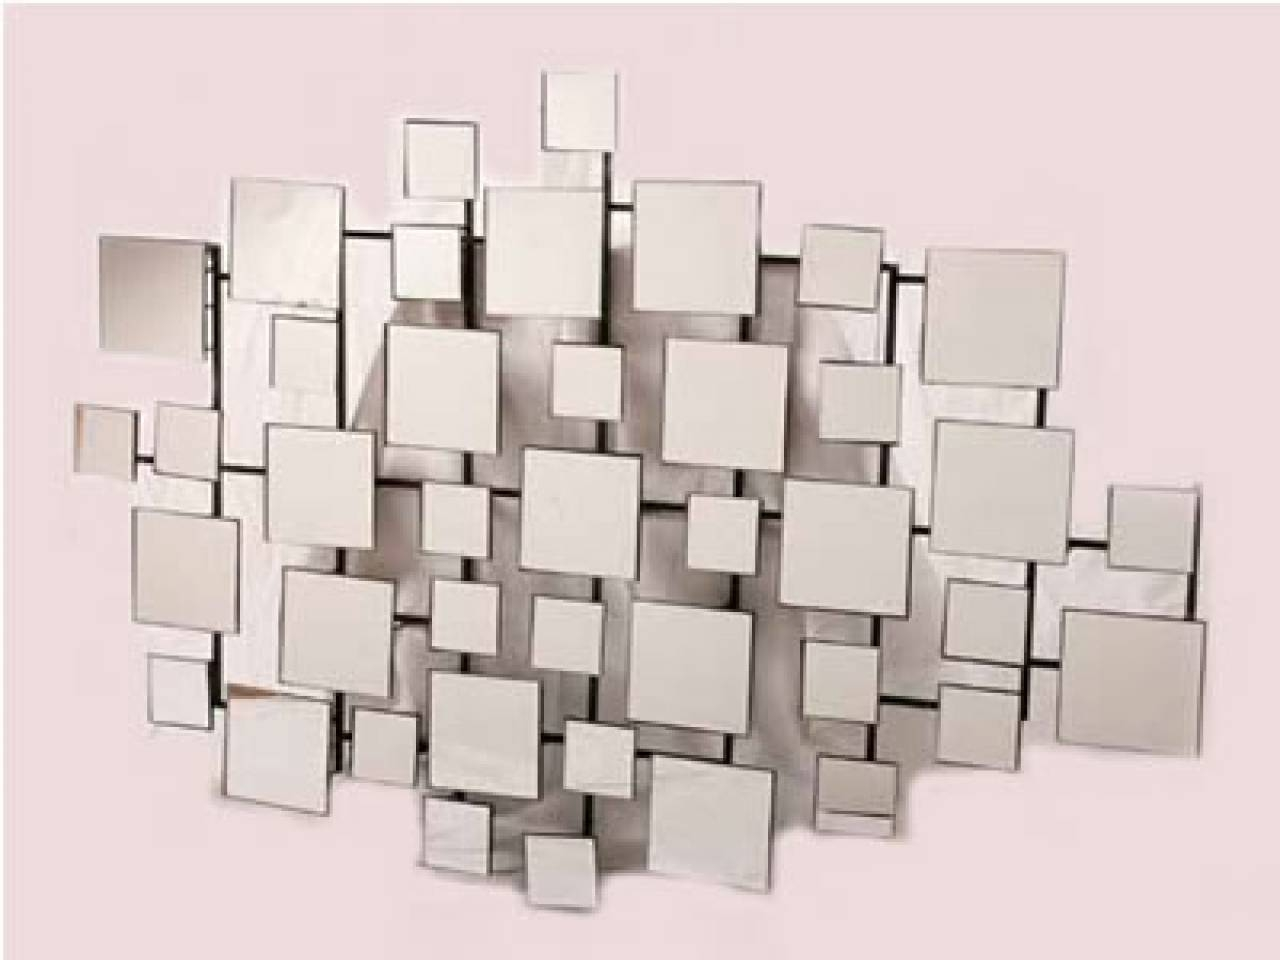 Wall Art Designs: Mirrored Wall Art Geometric Mirror Wall Art Regarding Best And Newest Modern Mirrored Wall Art (View 19 of 20)